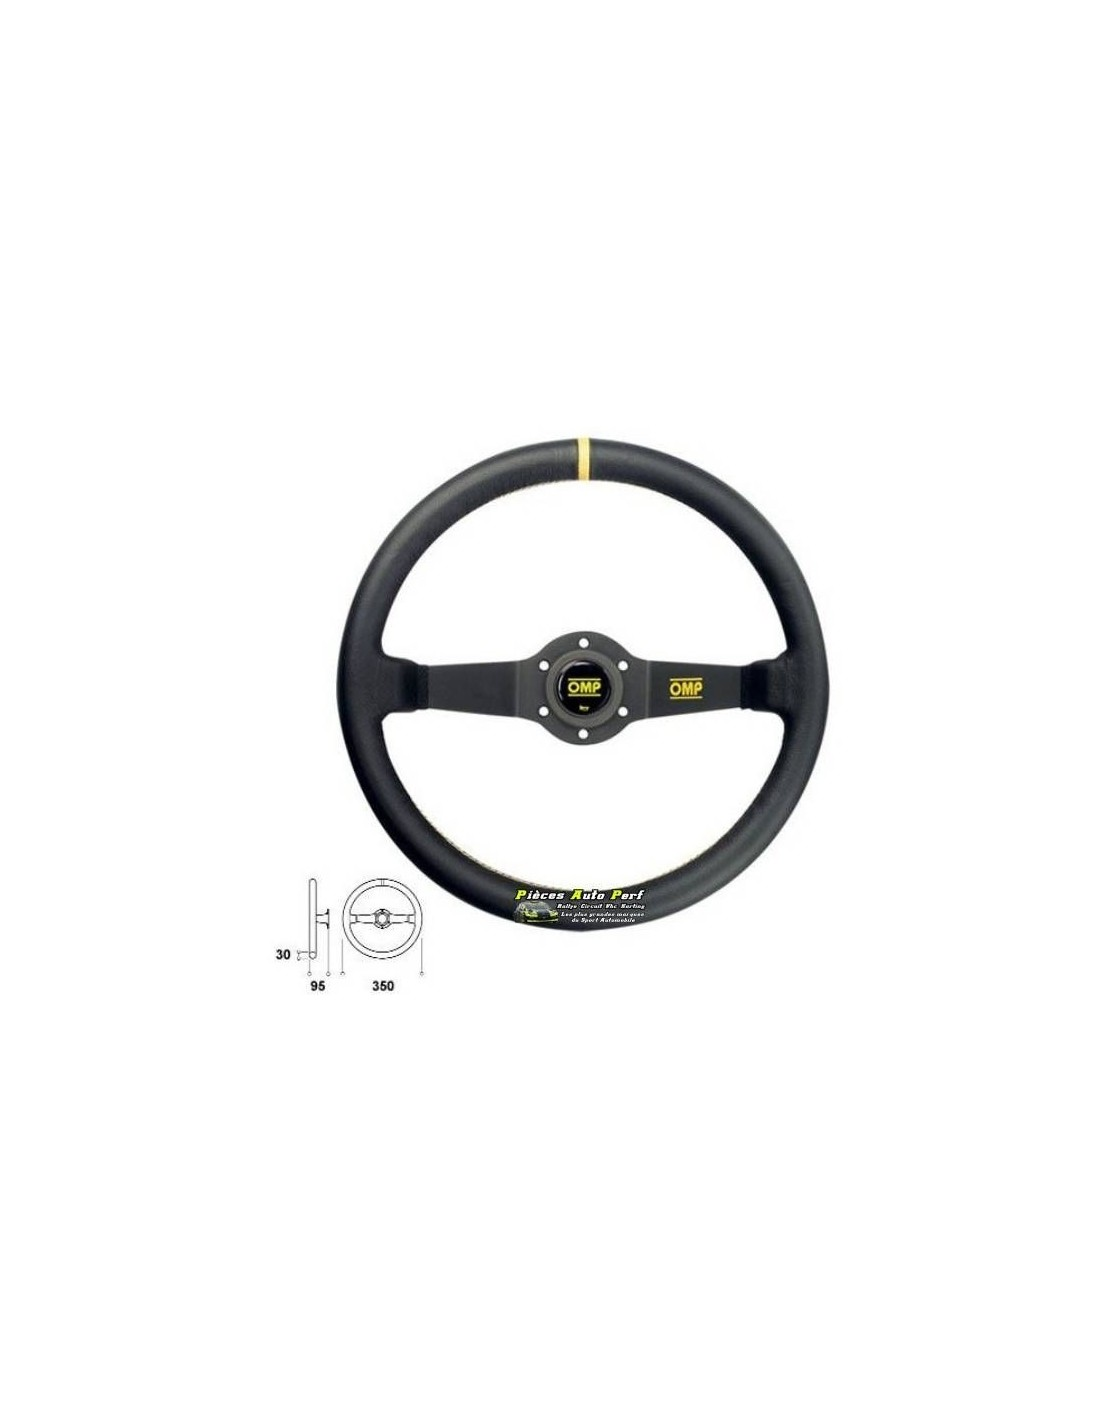 volant racing 350mm tulip 2 branches anodis es noir omp rally cuir noir. Black Bedroom Furniture Sets. Home Design Ideas